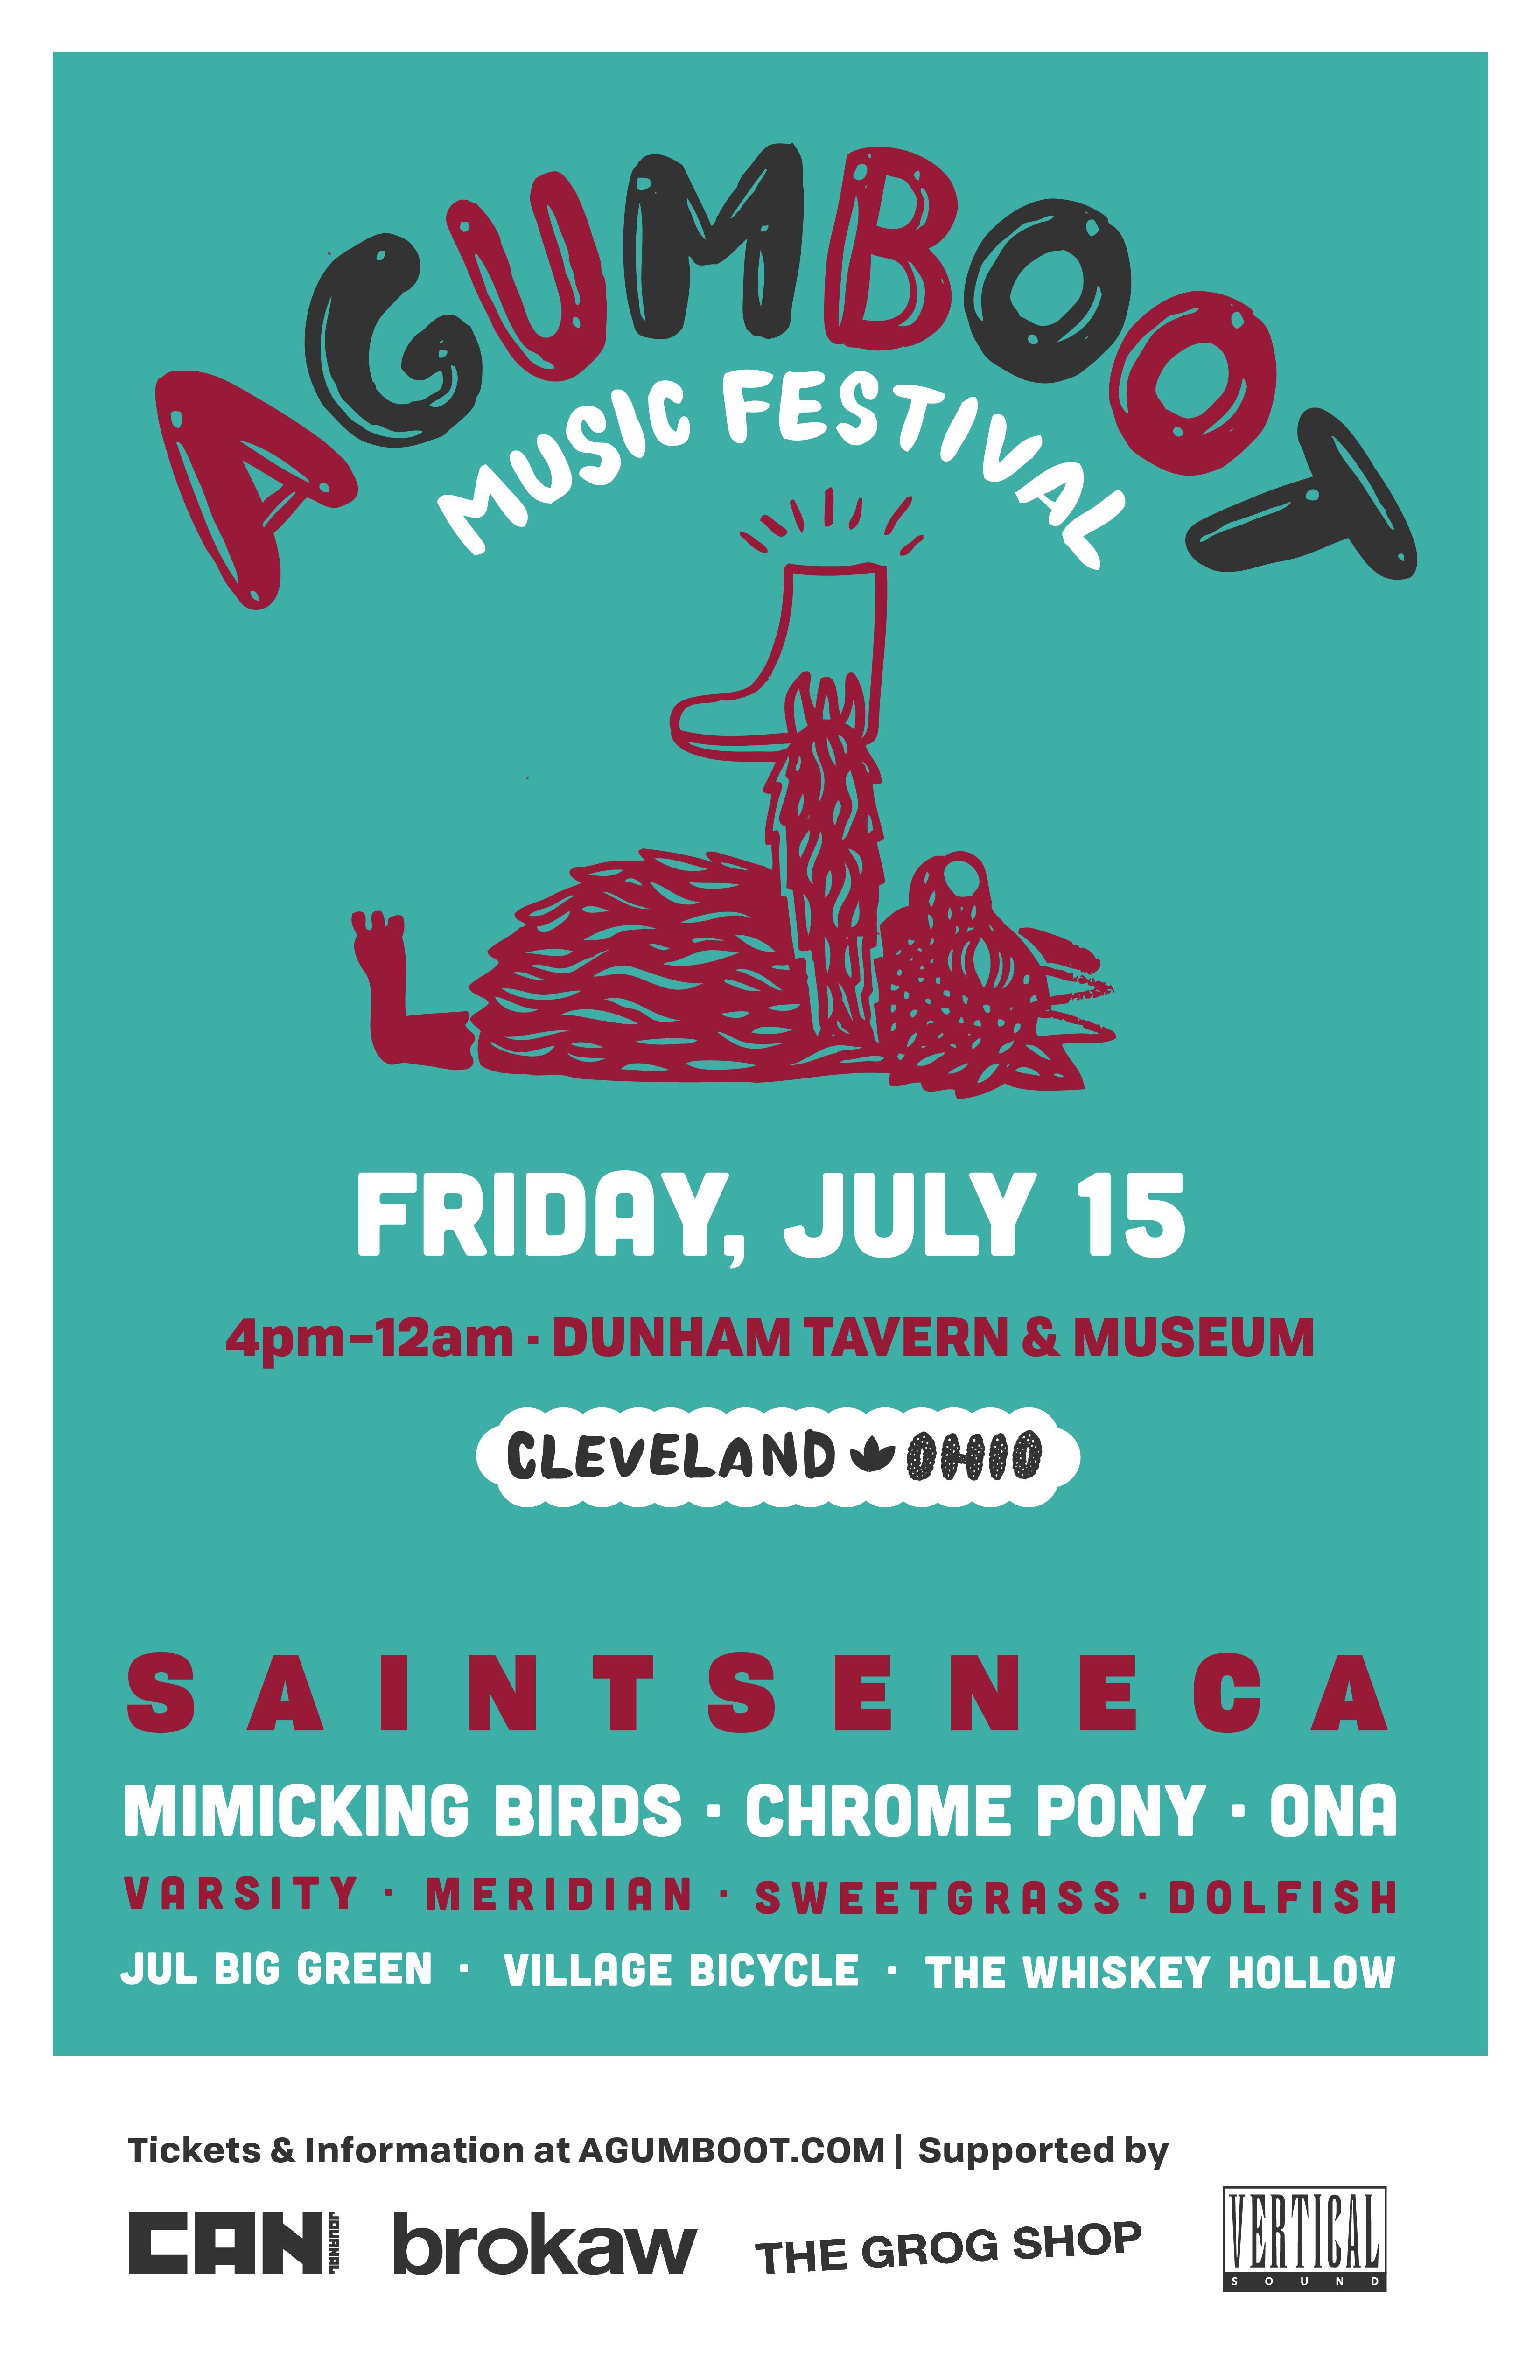 agumboot 2016 Cleveland Music Festival